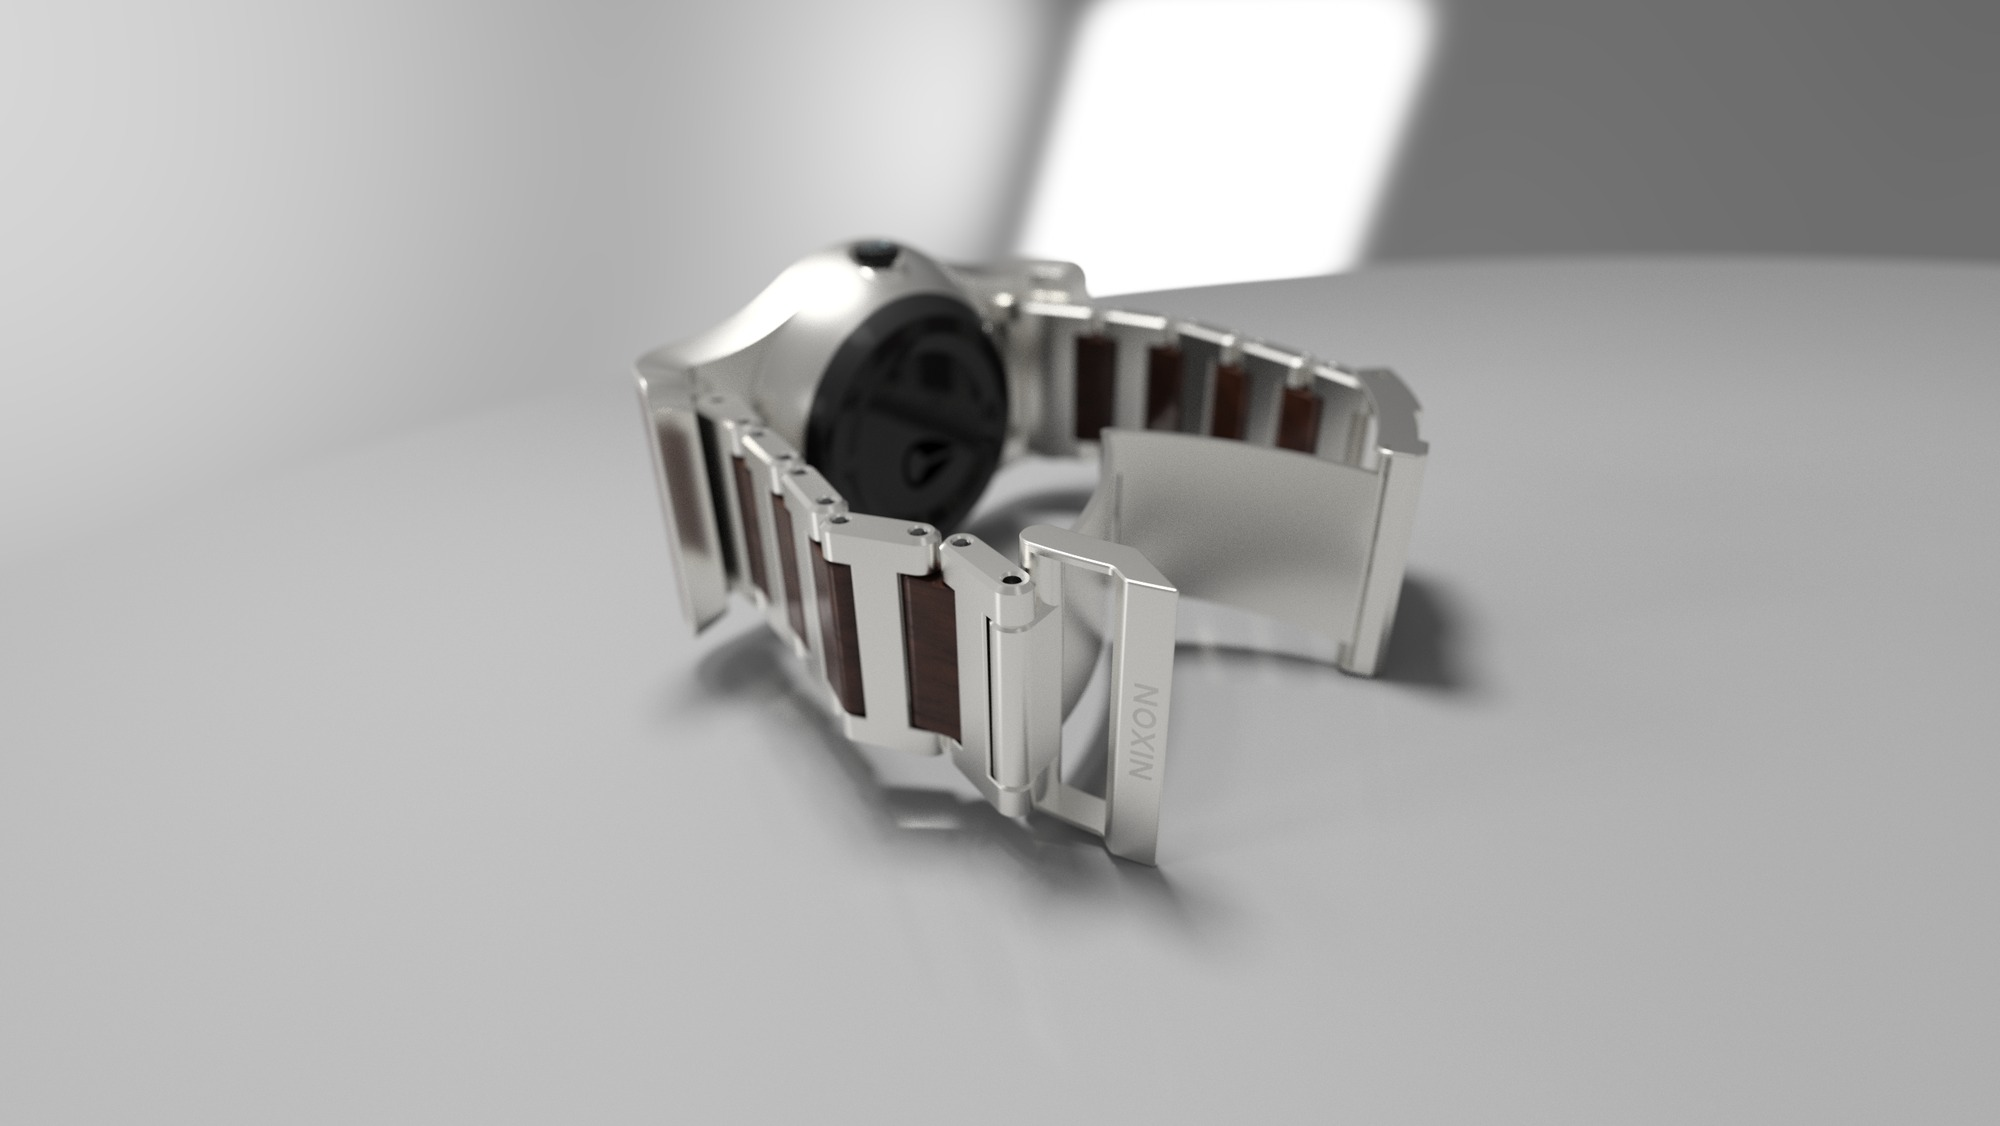 Wach_concept_1_2015-nov-25_11-58-28am-000_customizedview61419416